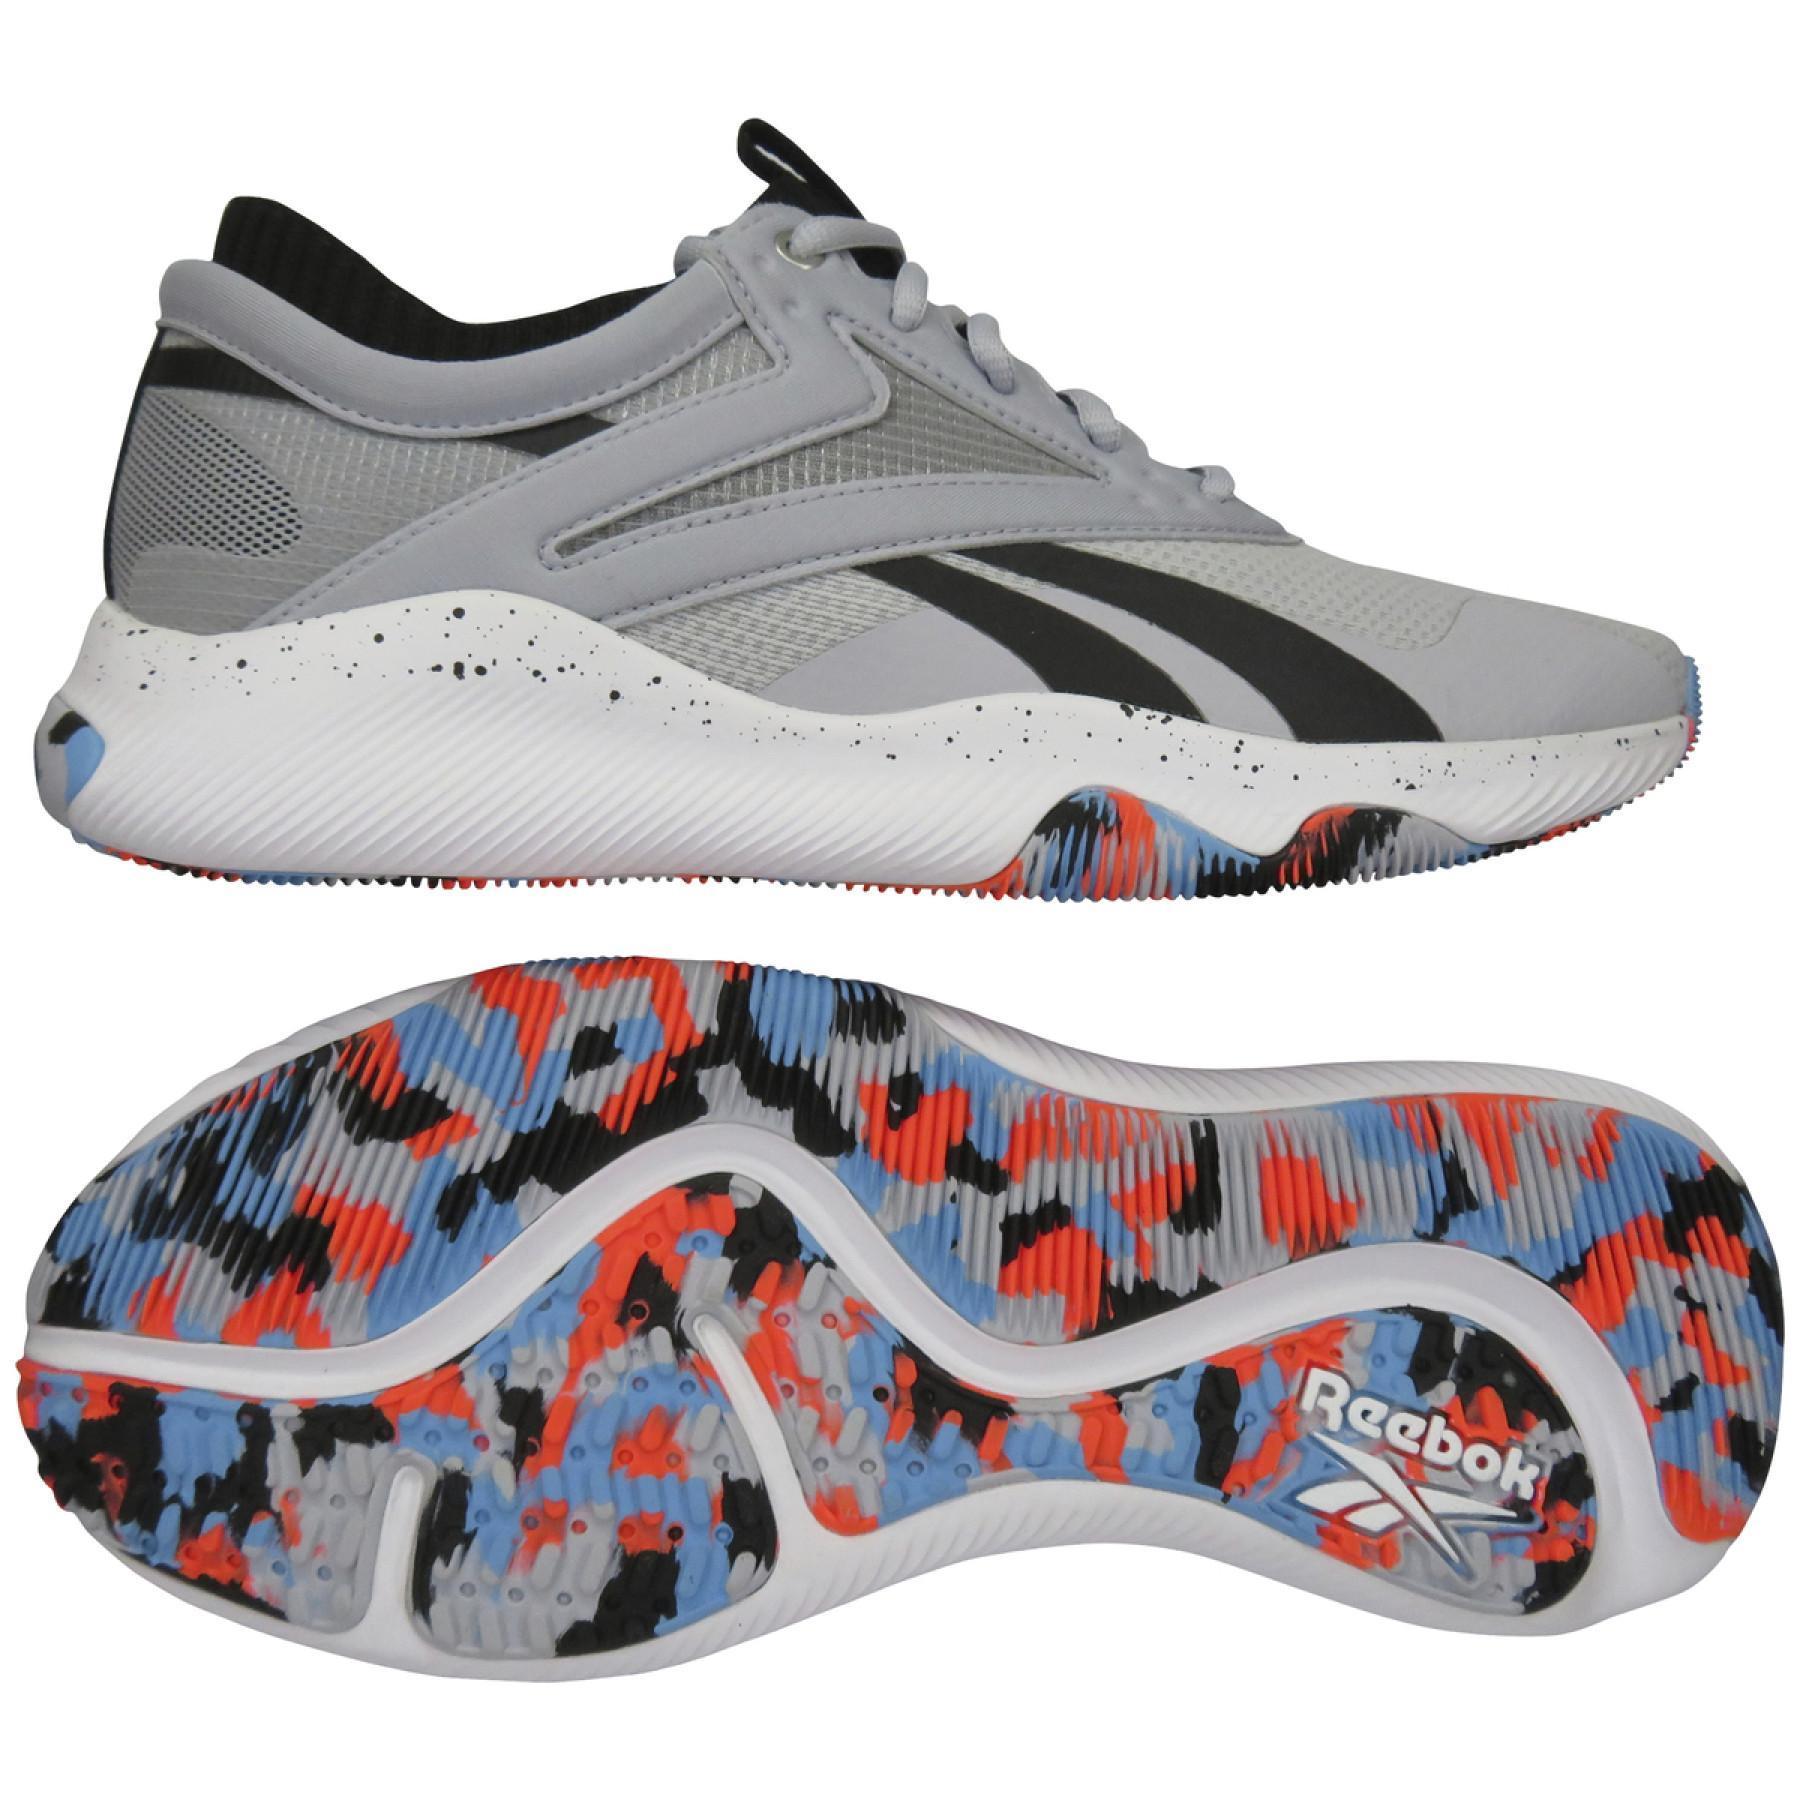 Chaussures Reebok HIIT